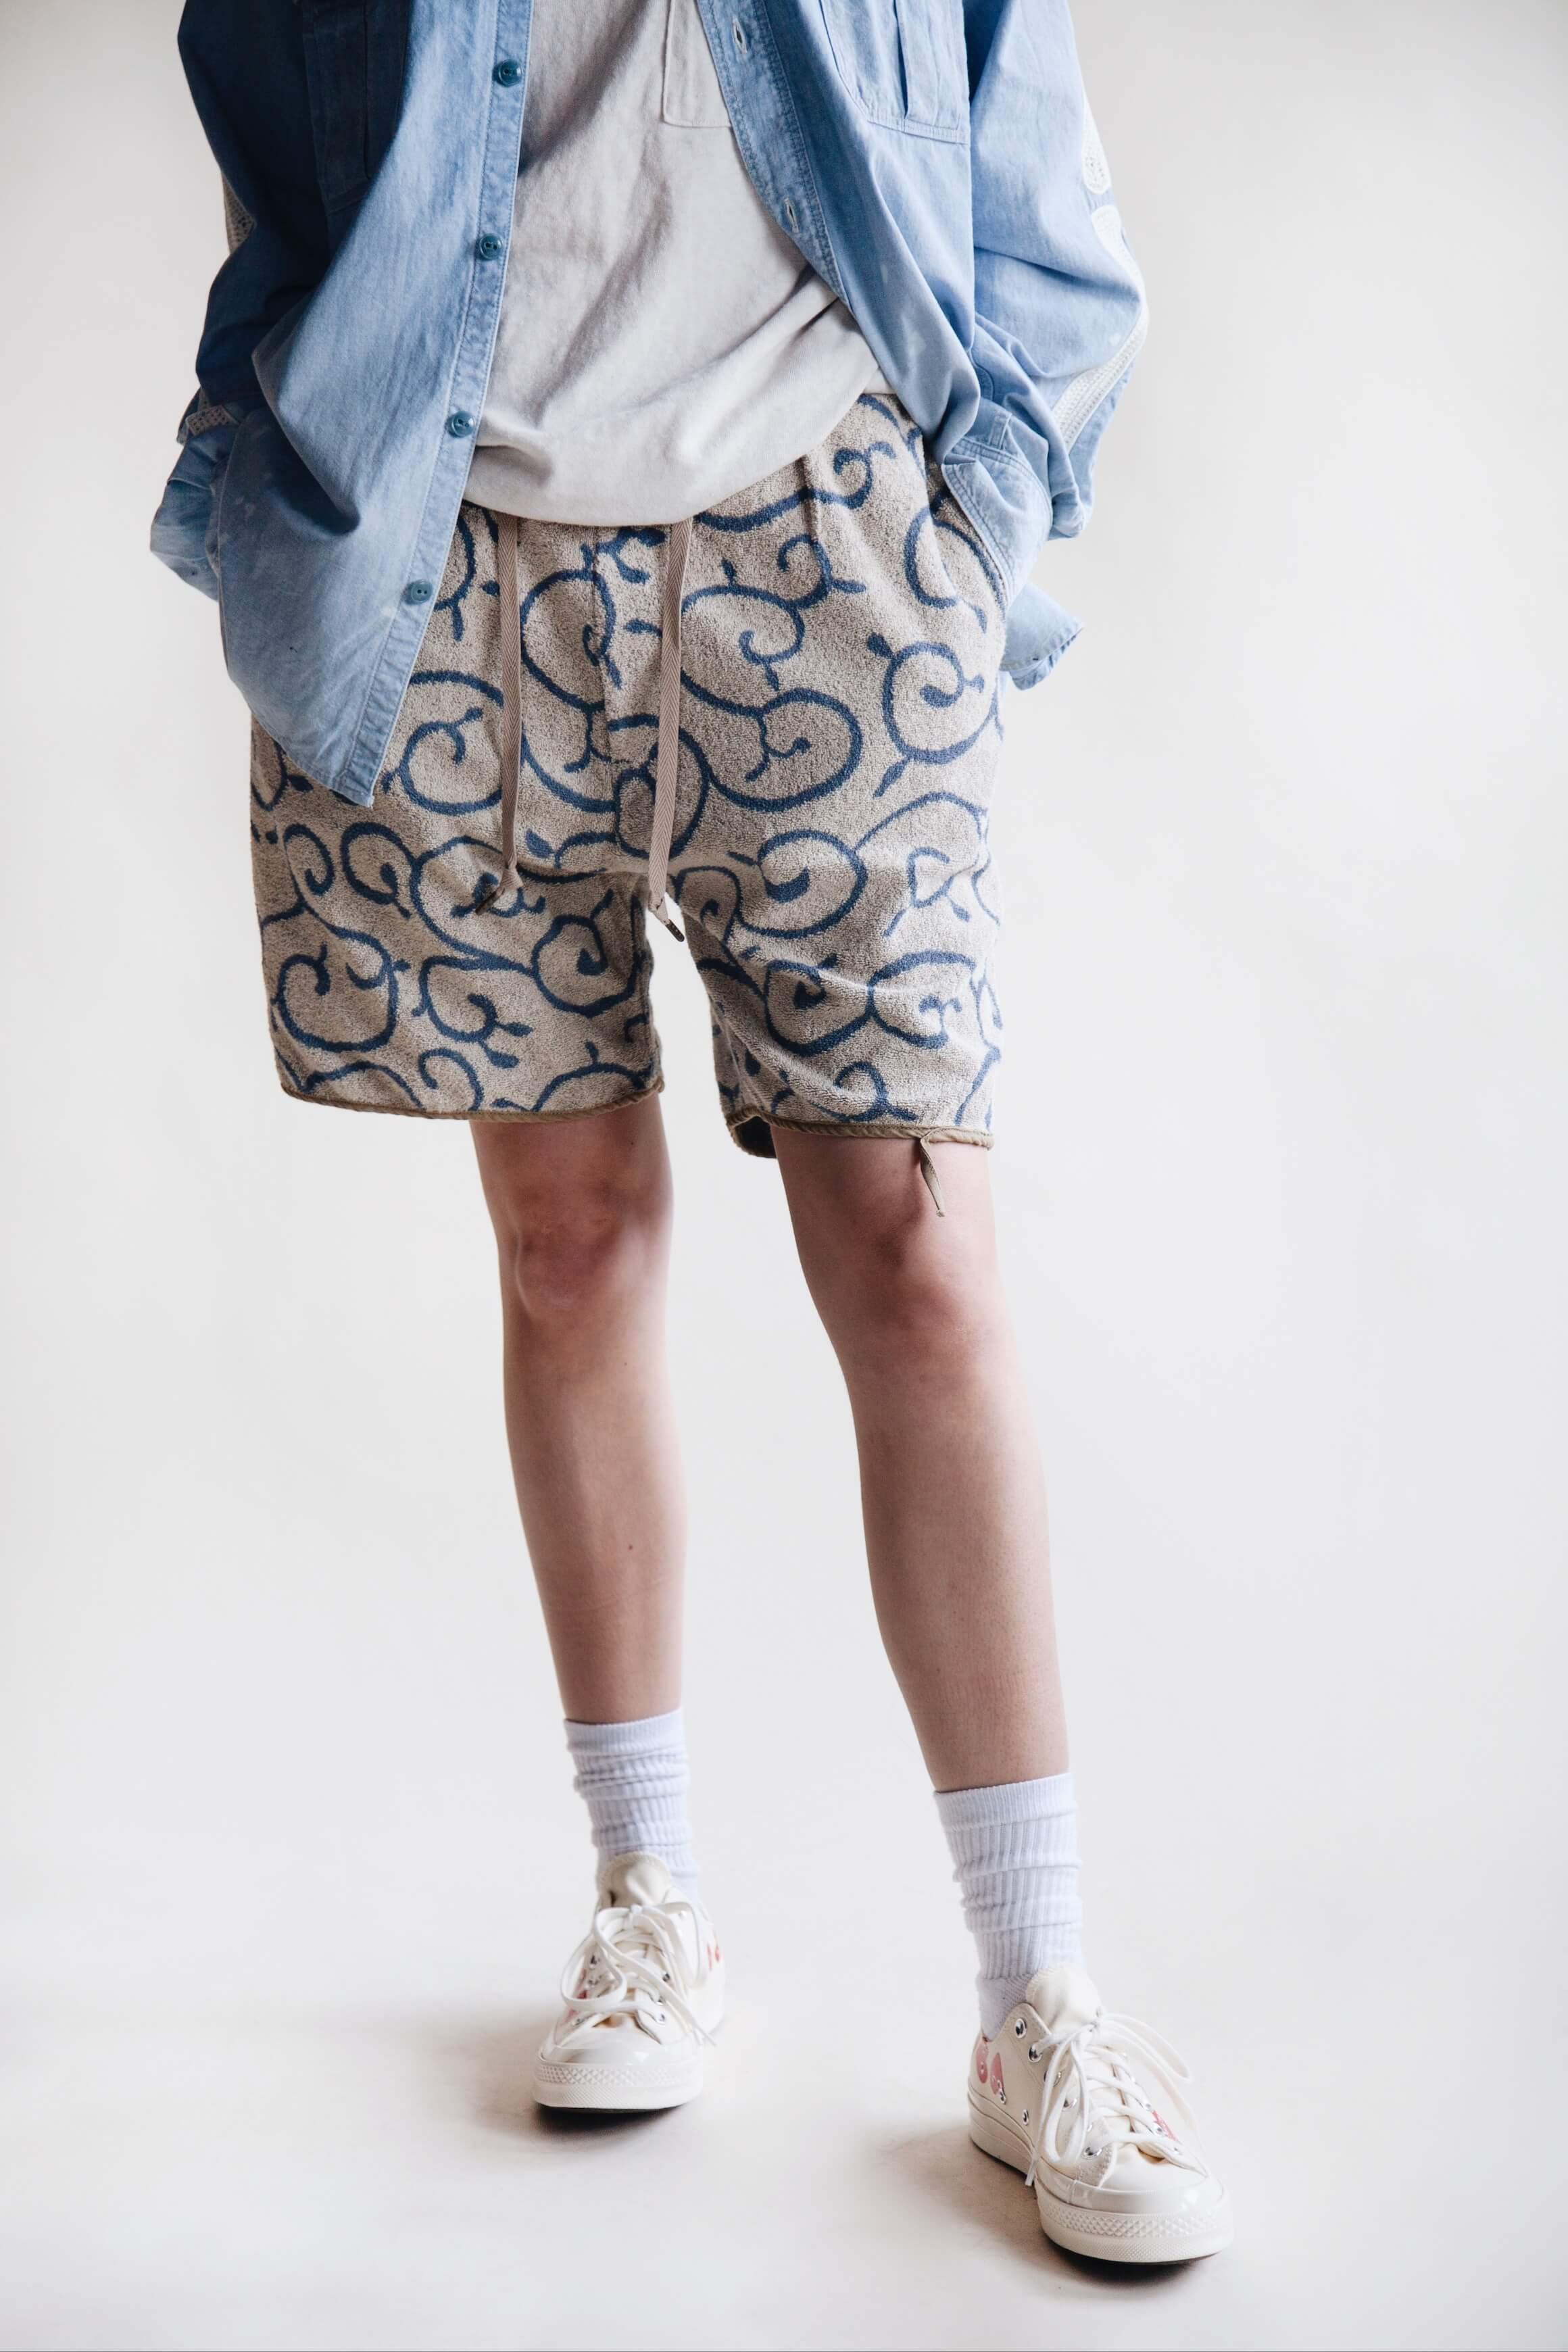 kapital clothing japan chambray work shirt bone embroidery, gauze jersey crew pocket tee, irago pile karakusa shorts and comme des garcons play x converse shoes on body